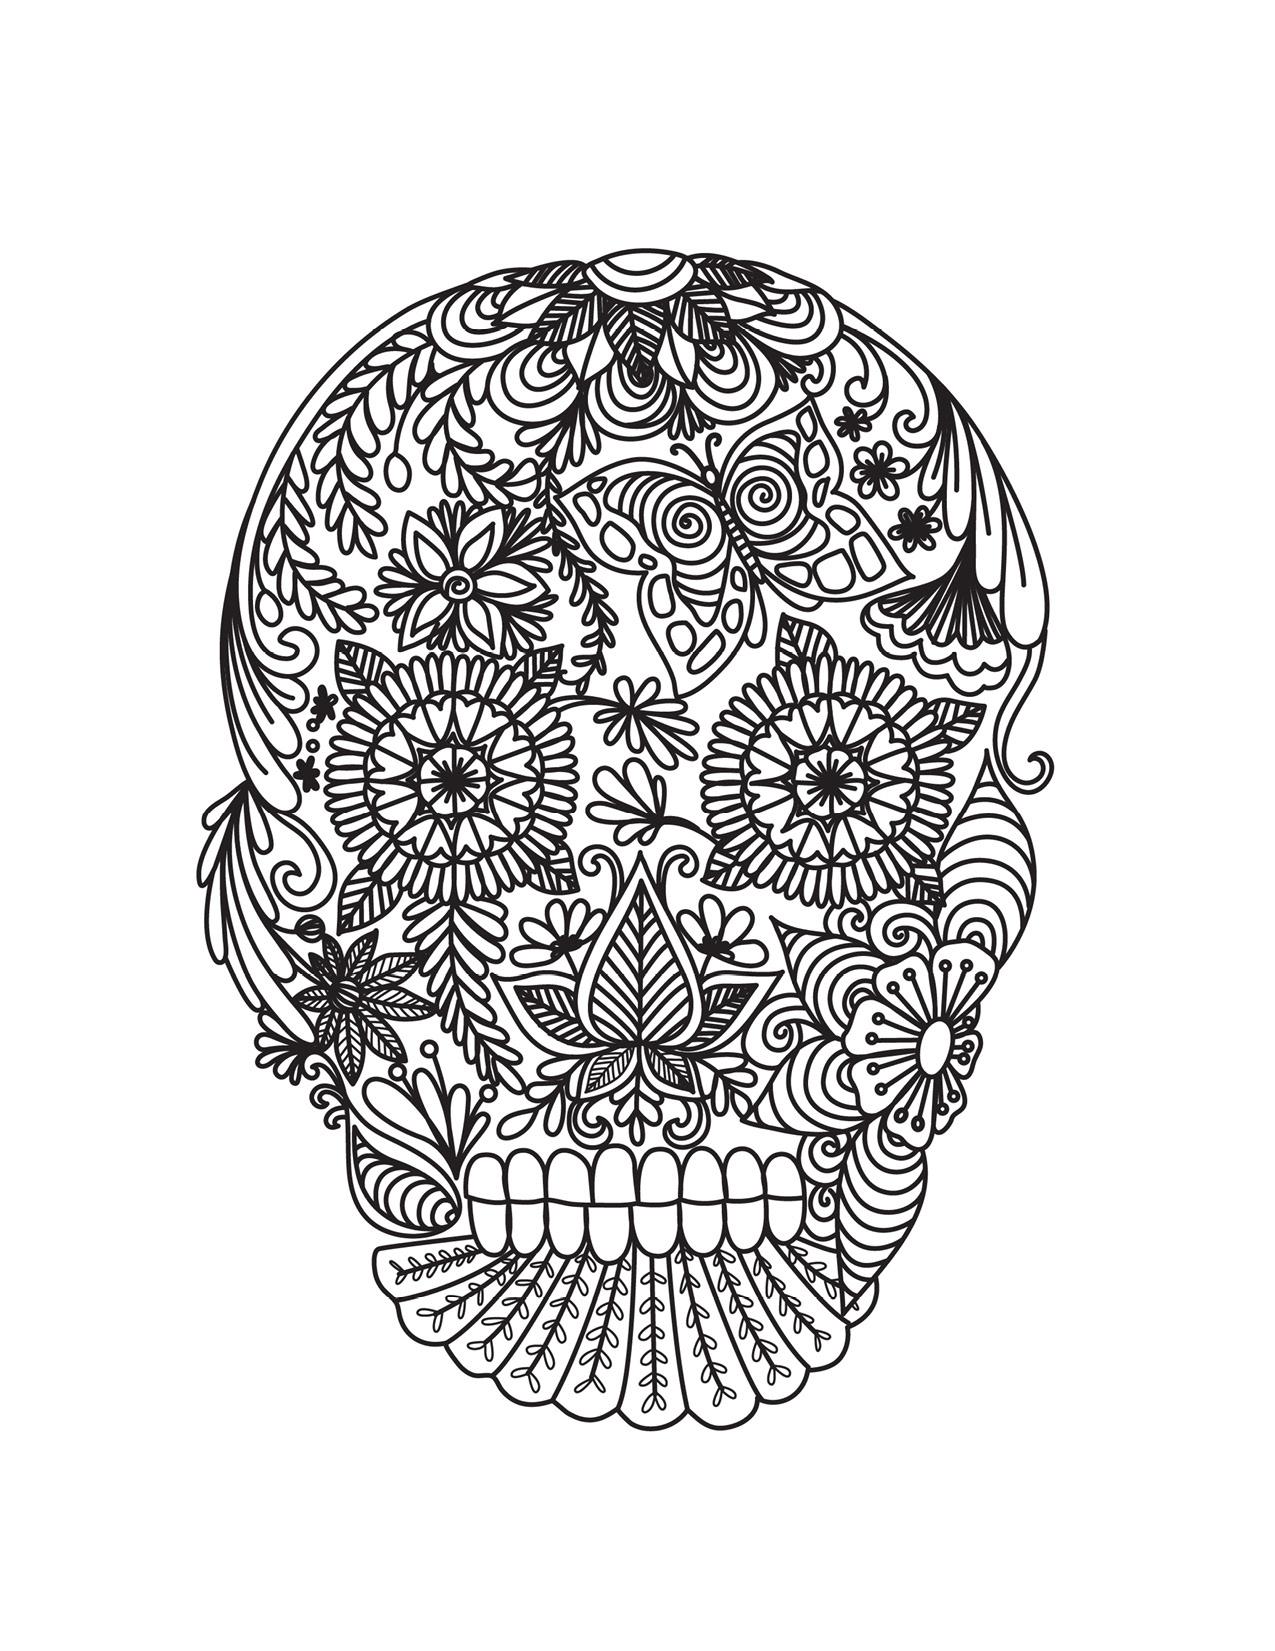 Dessin Mexican Skull Tattoo Pour Adulte À Imprimer à Crane Mexicain Dessin